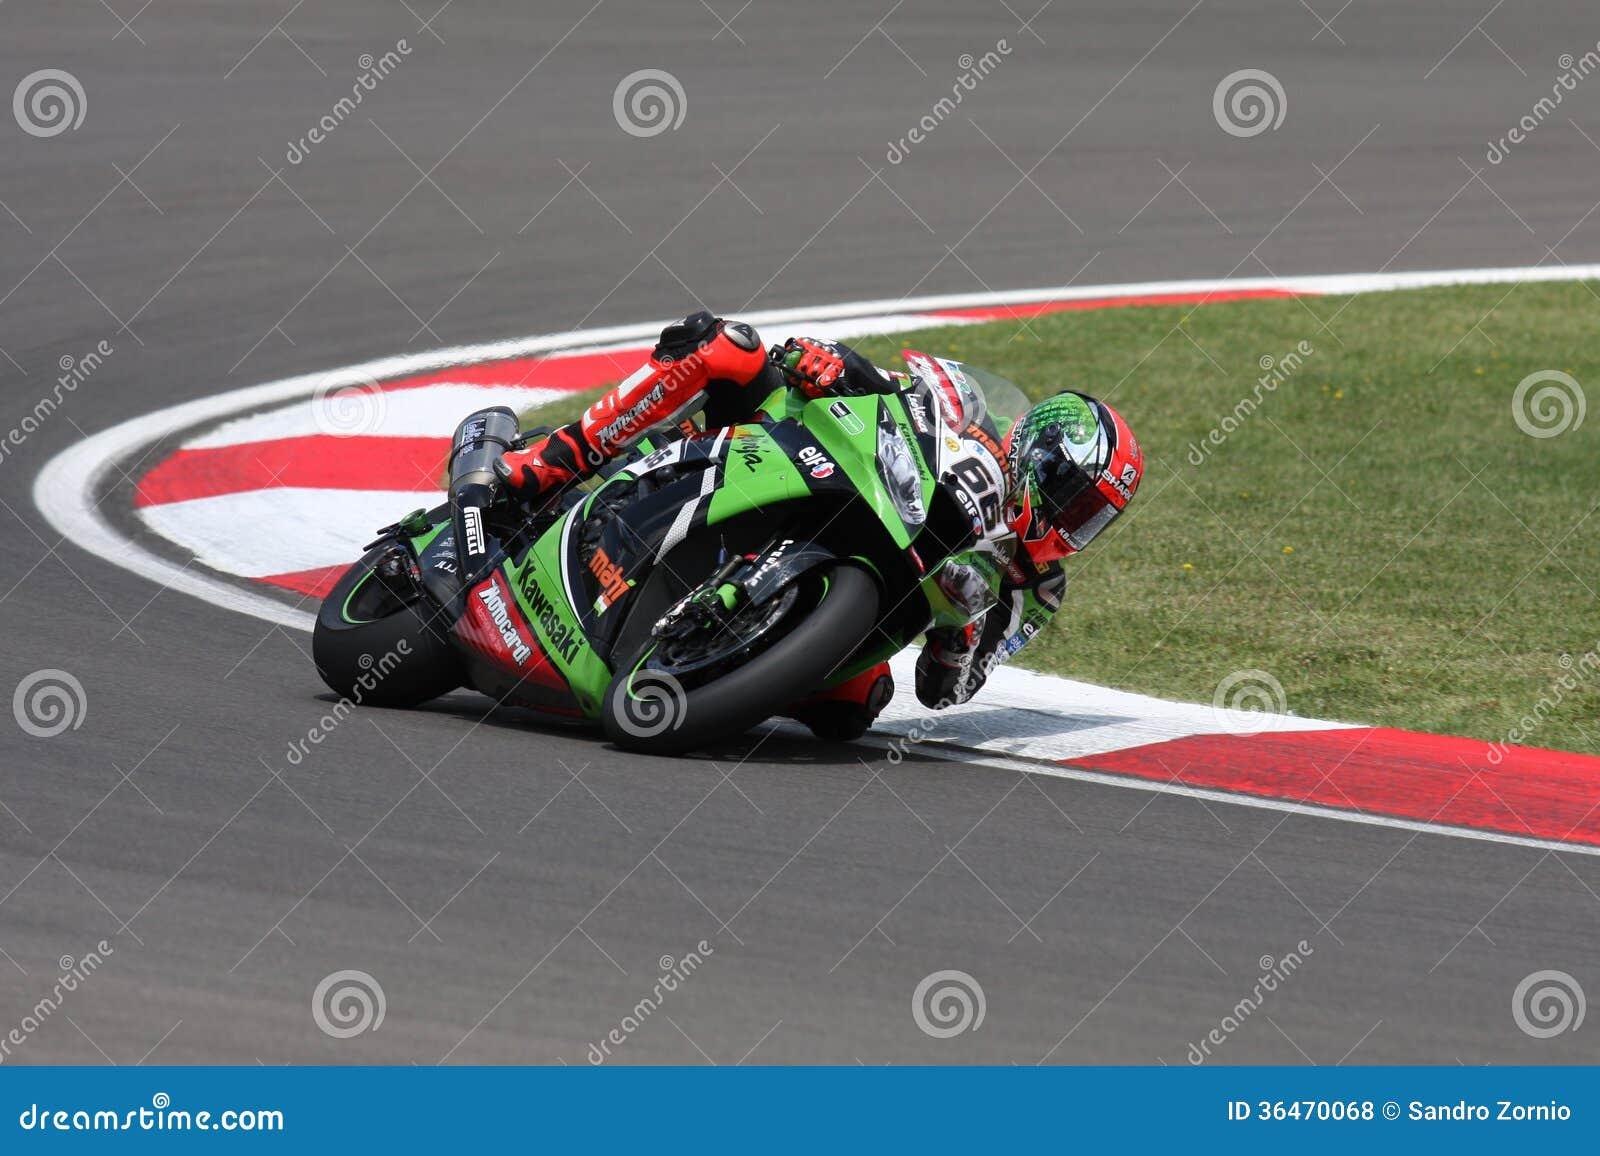 Tom Sykes #66 on Kawasaki ZX-10R Kawasaki Racing Team Superbike WSBK